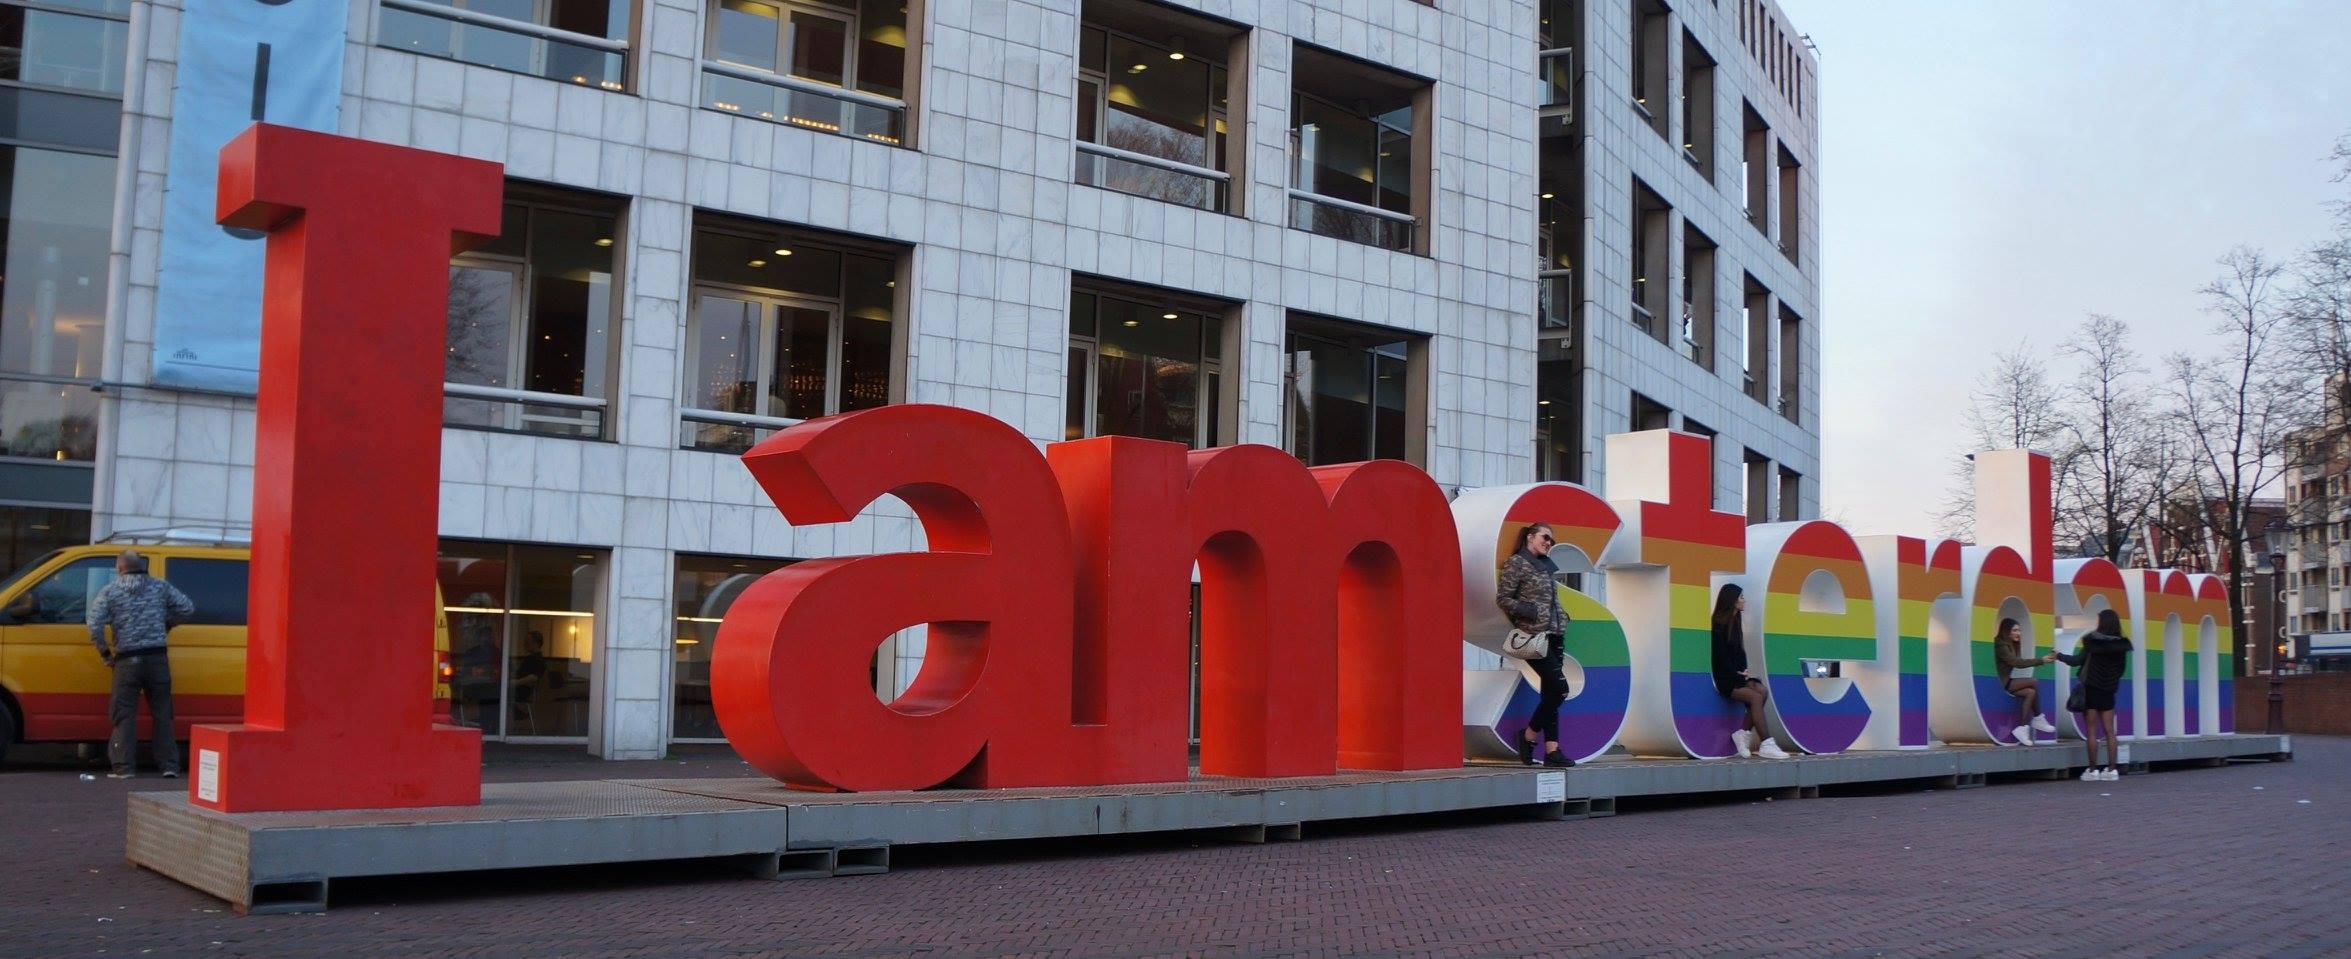 Tour ne Amsterdam, Rotterdam, Hage